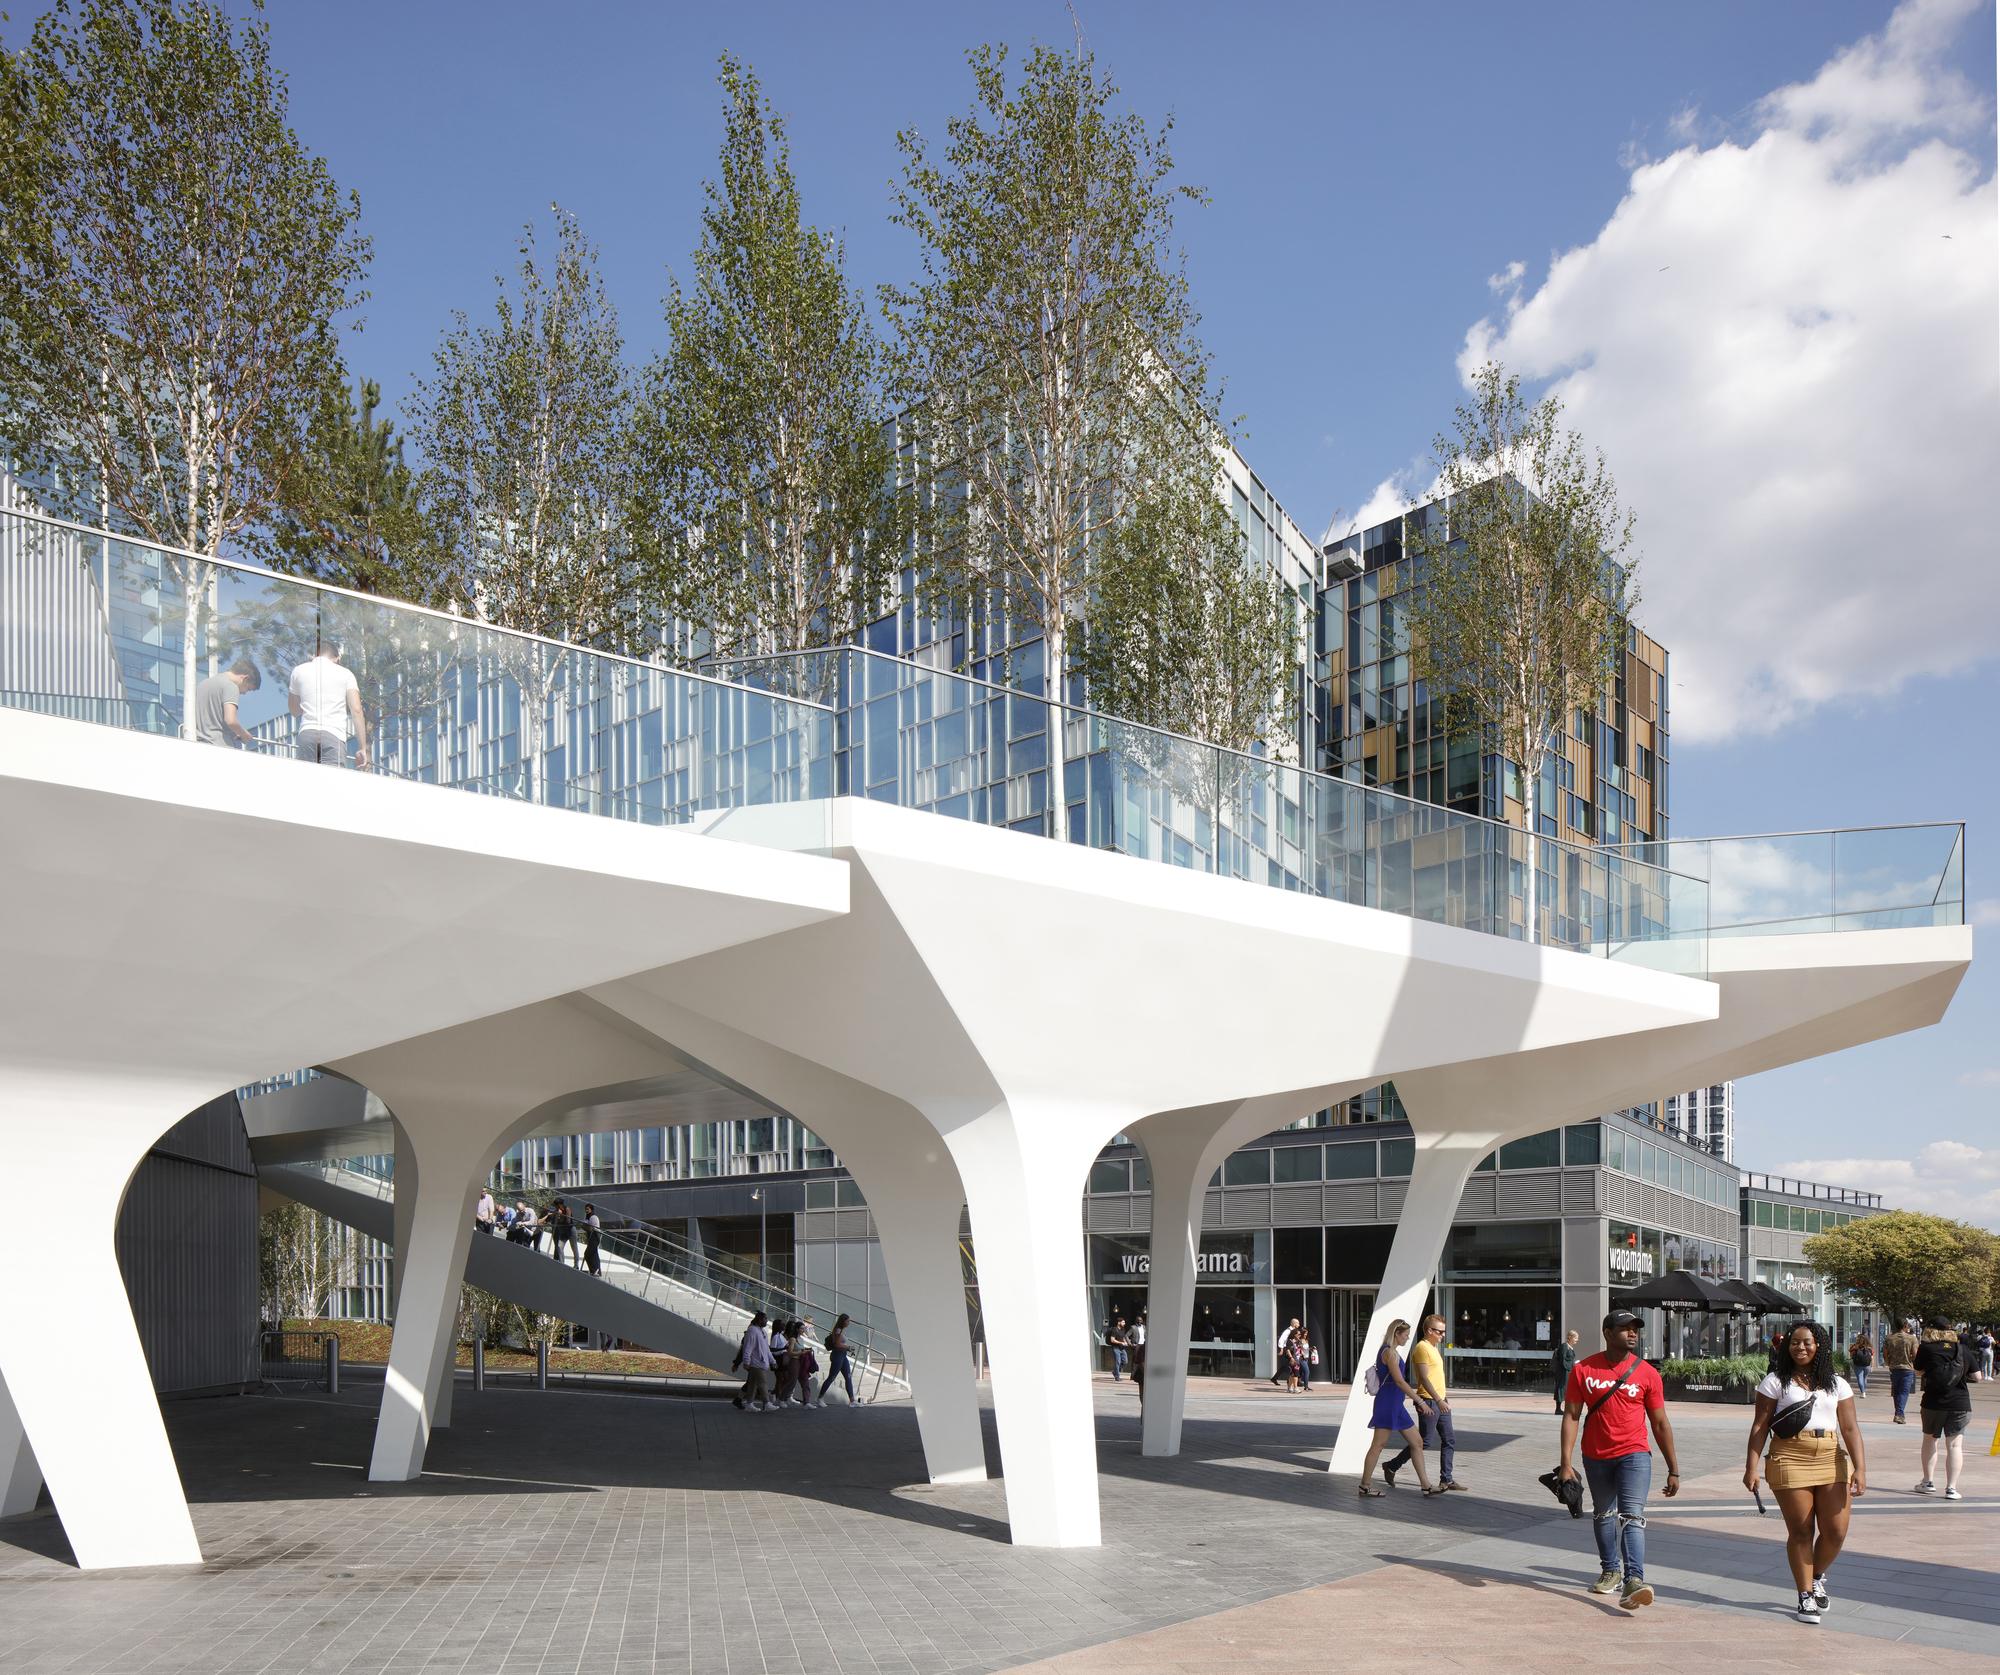 The Tide Cultural Linear Park / Diller Scofidio + Renfro + Neiheiser Argyros